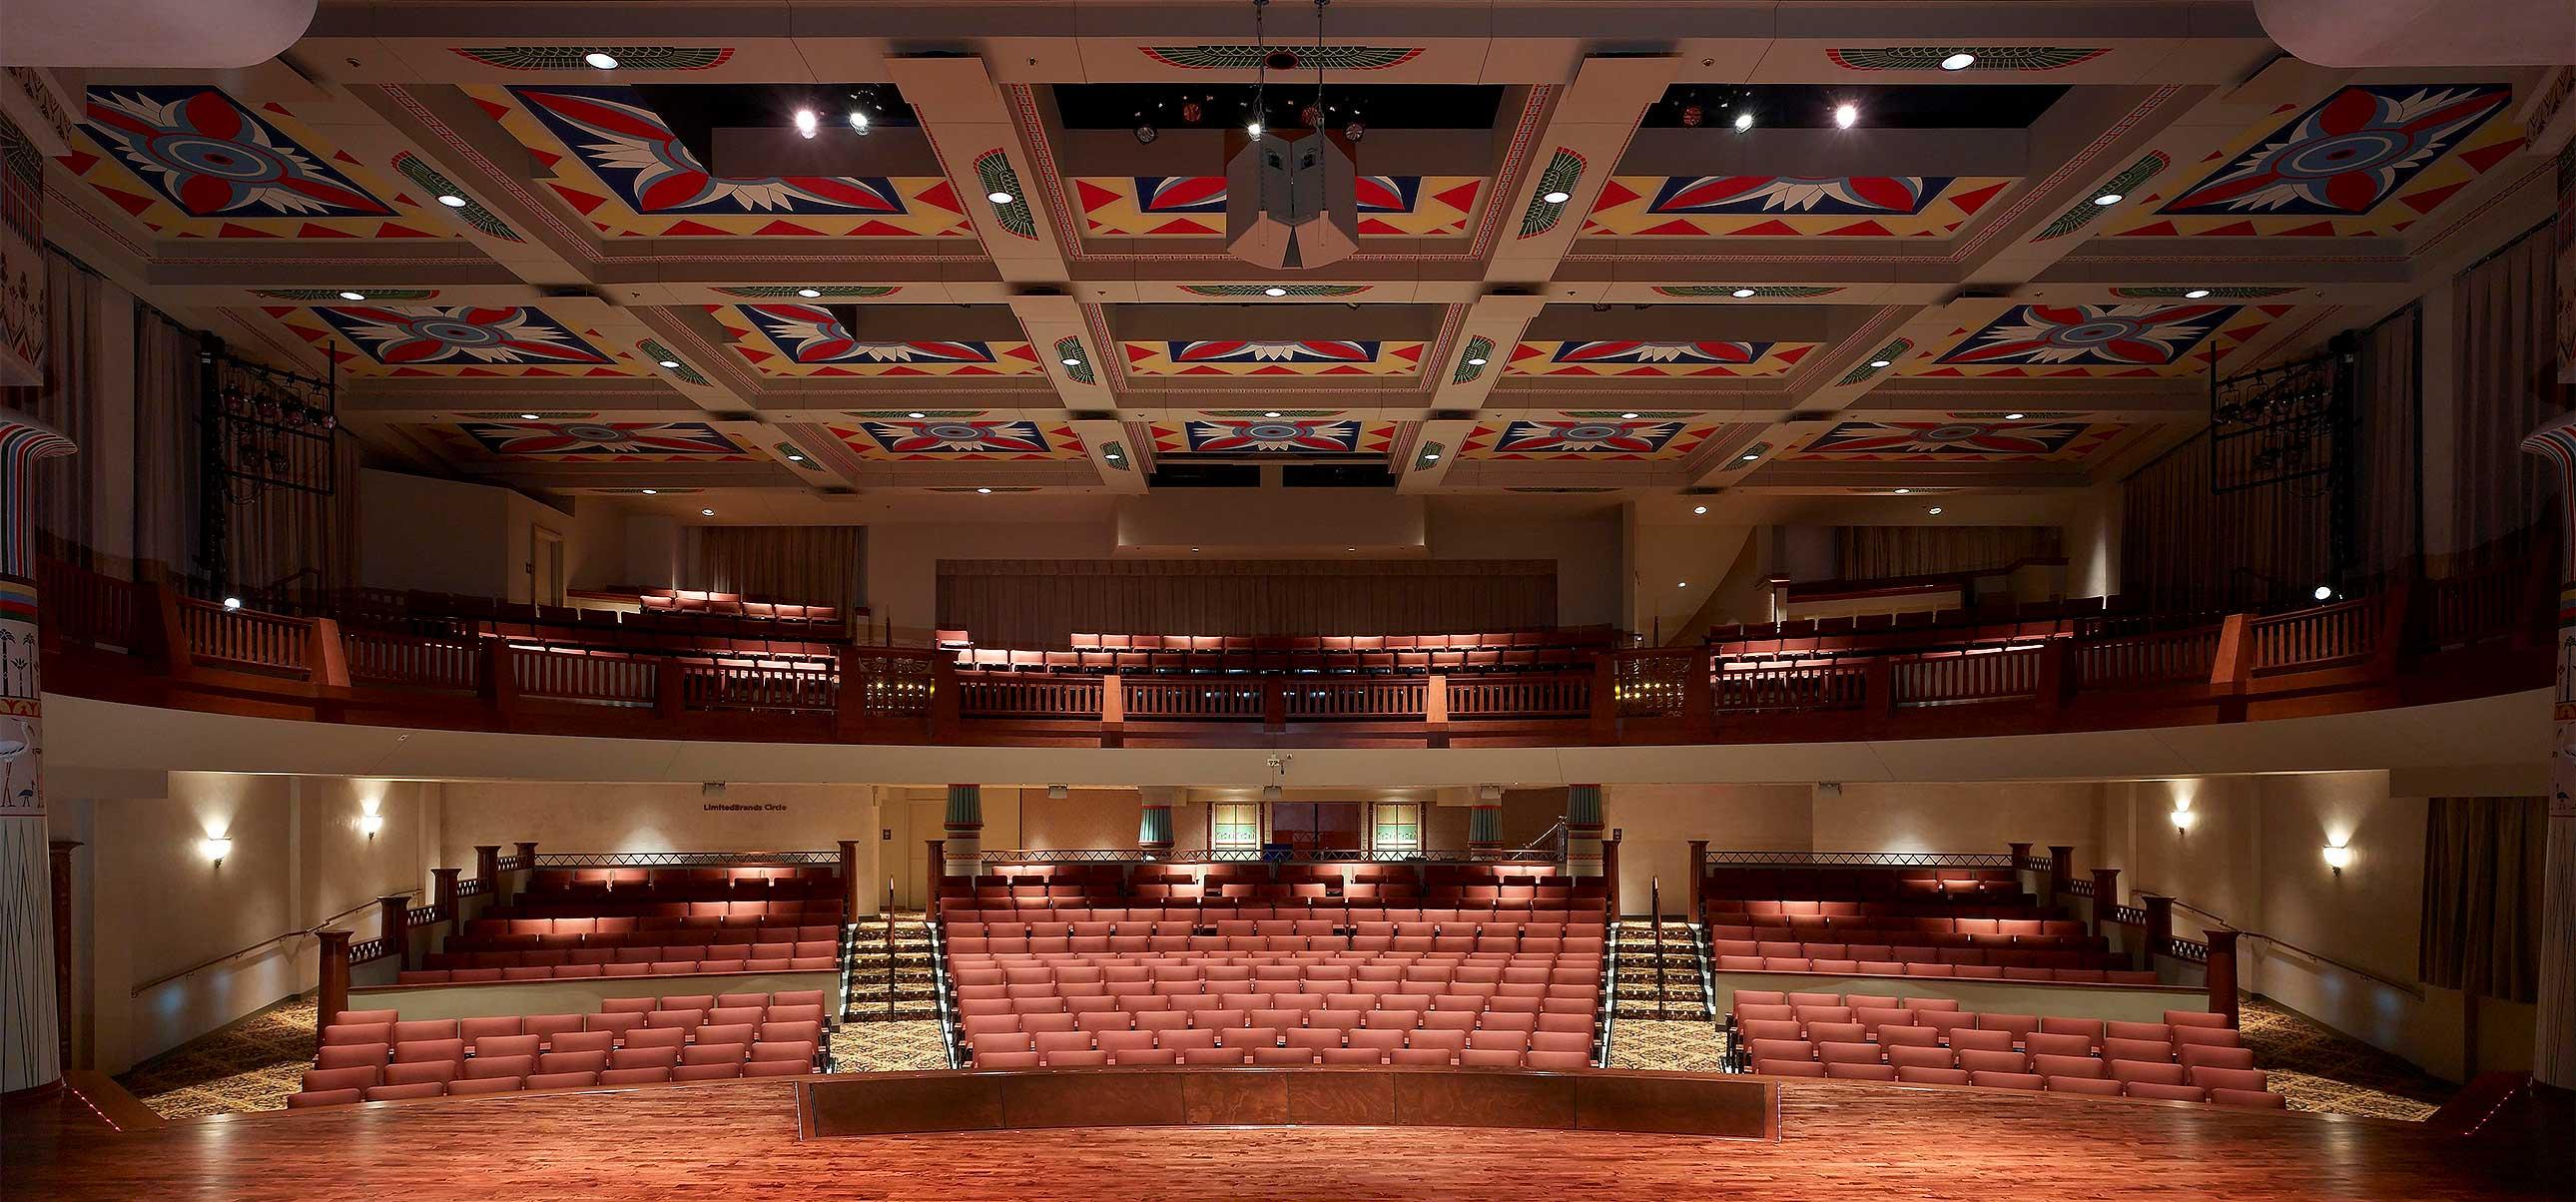 Lincoln-HousefromStage-Slidel.jpg